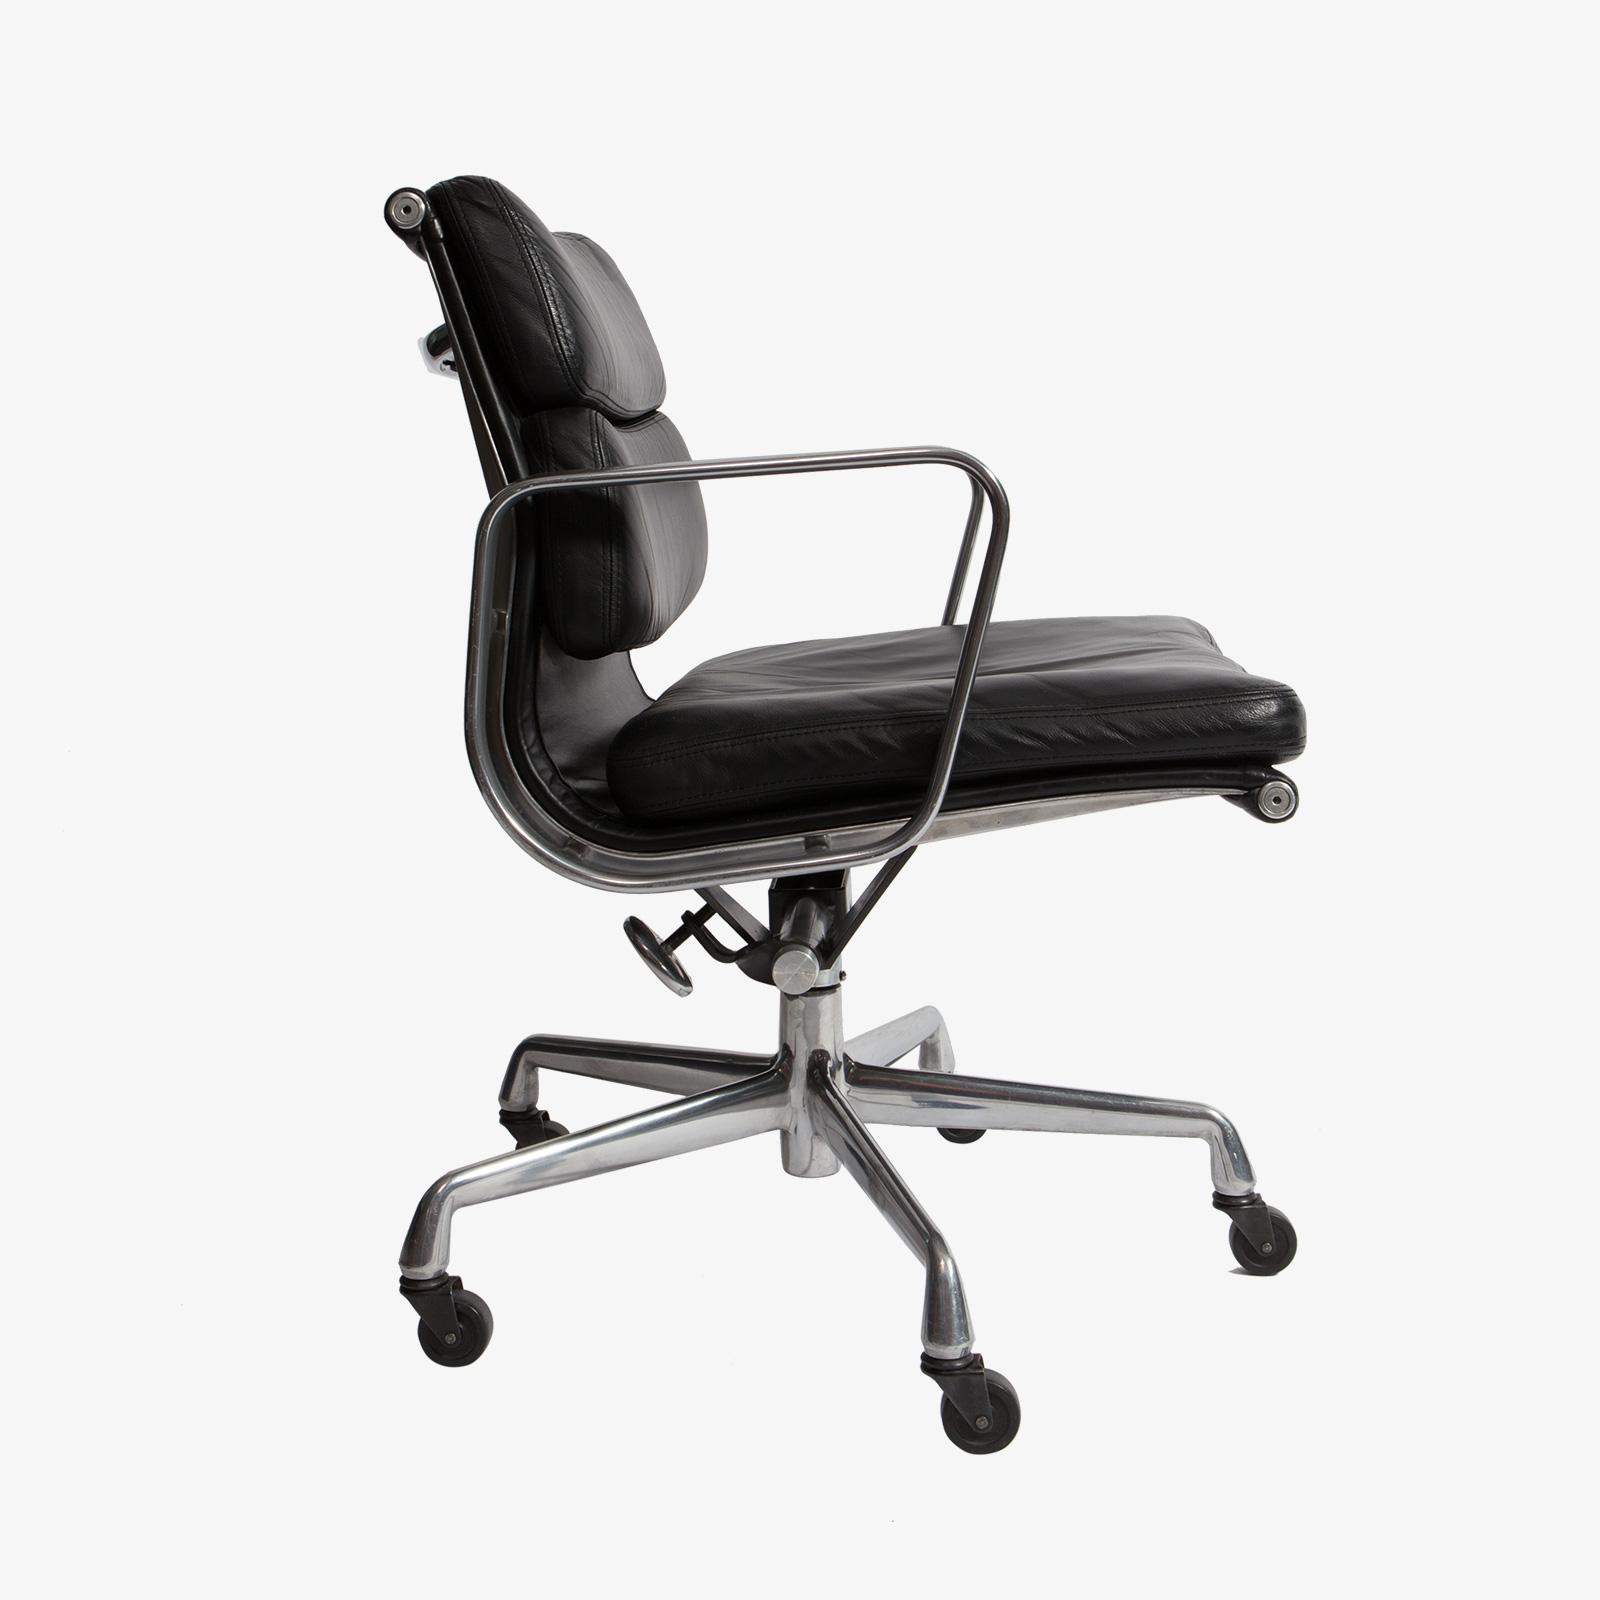 Eames Desk Chair Herman Miller  reGeneration